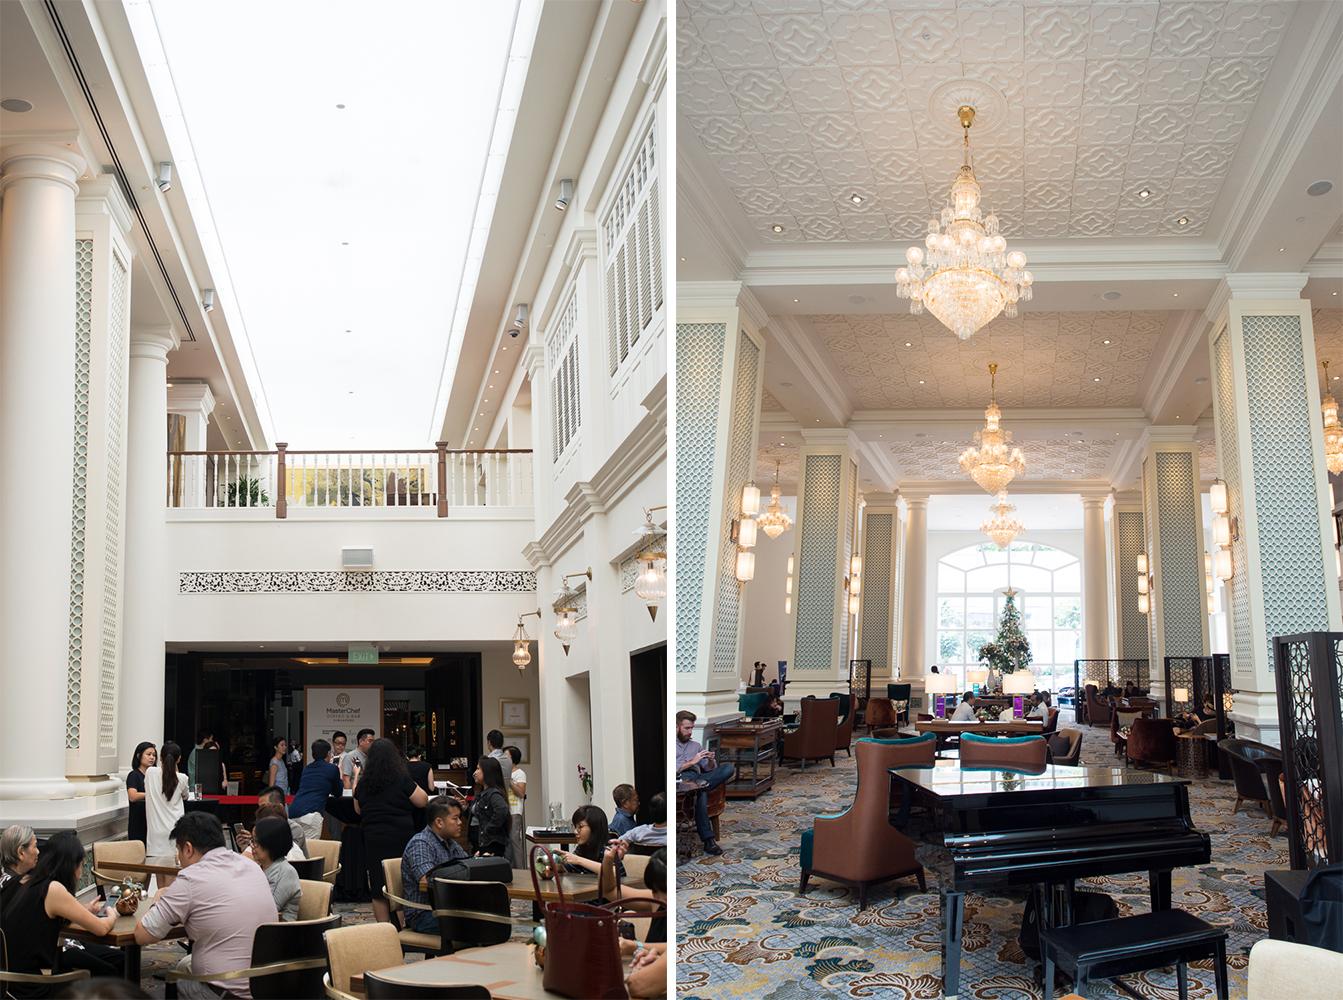 MasterChef Dining and Bar Singapore Intercontinenal Hotel, Singapore